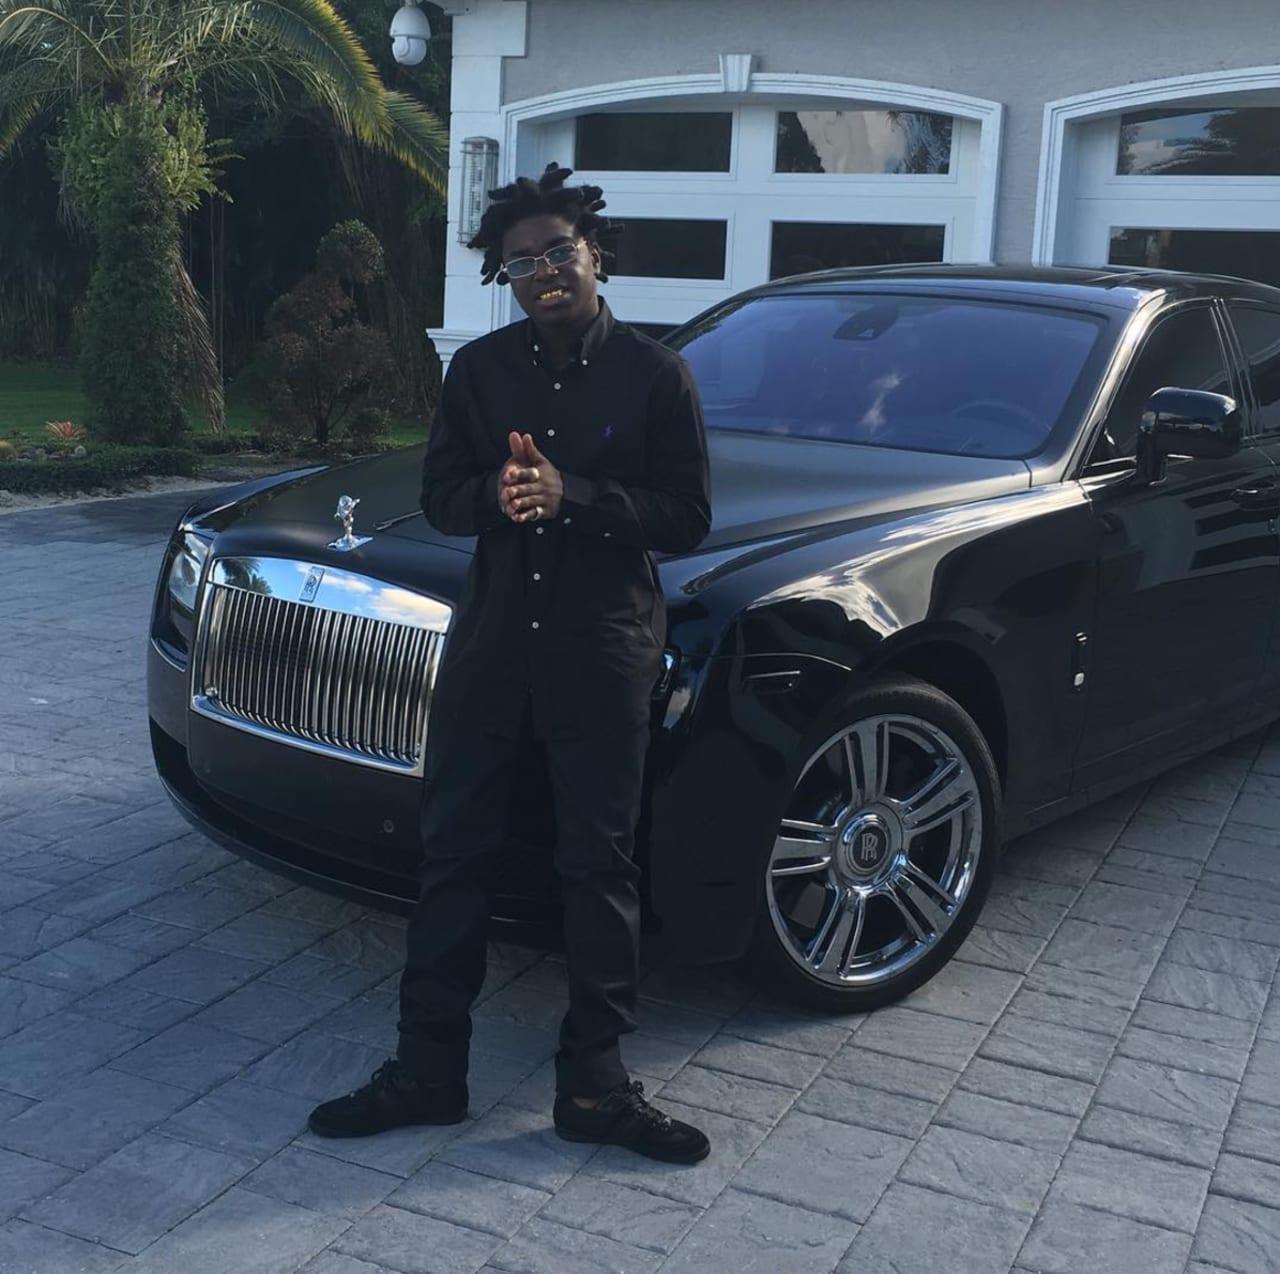 Kodak Black Challenges Lil Wayne to Fight: 'I'm Finna Knock That Stupid Ass  N**** Out'